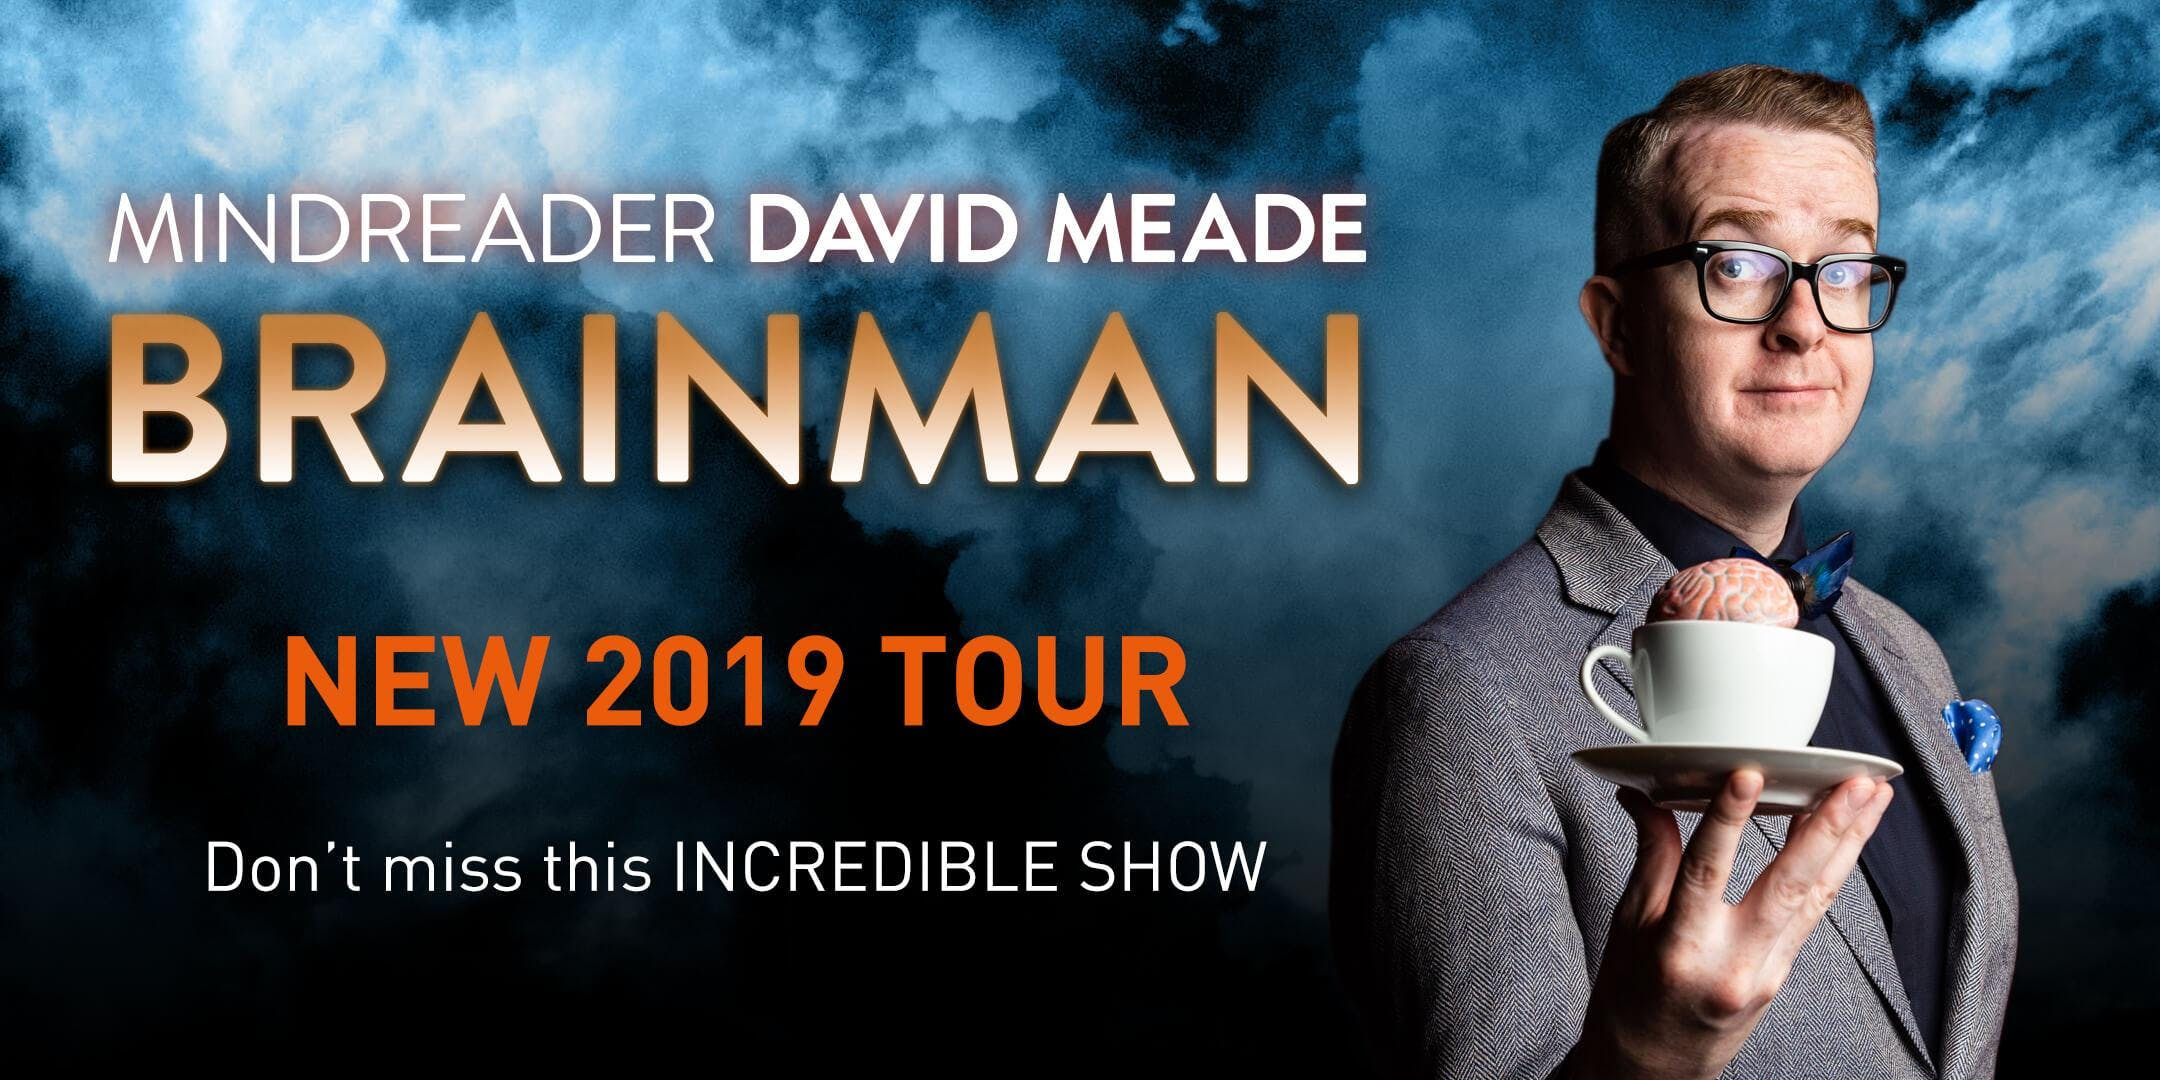 David Meade Mindreader: BRAINMAN - Newry, Town Hall